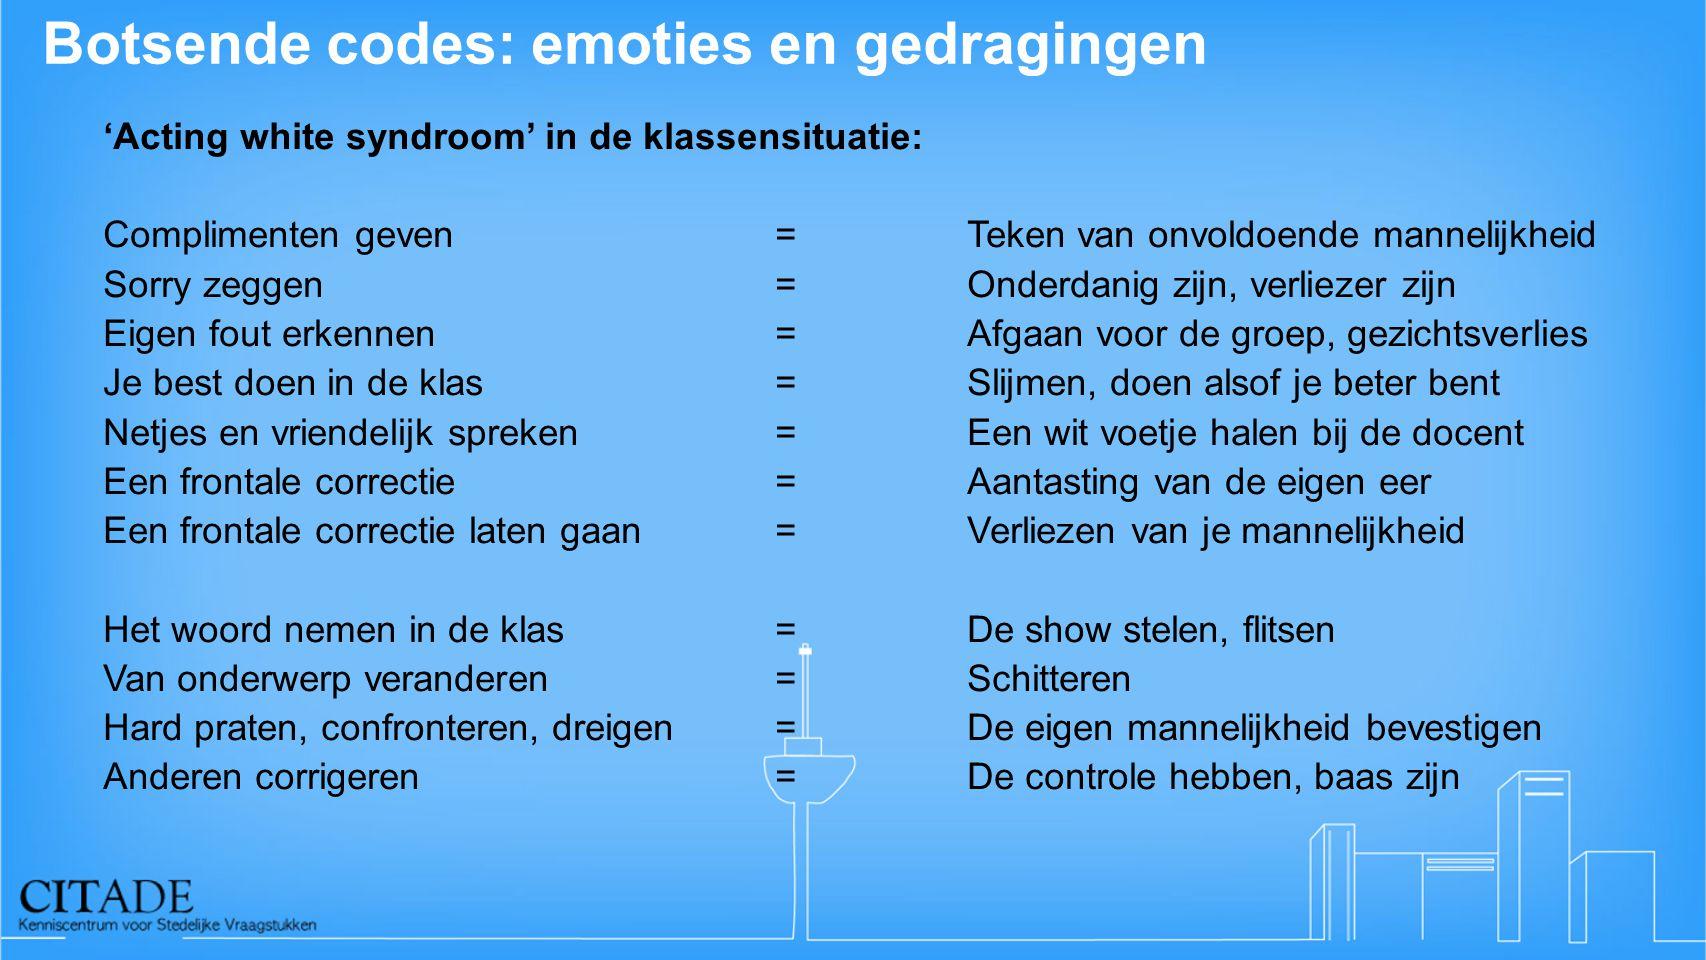 Botsende codes: emoties en gedragingen